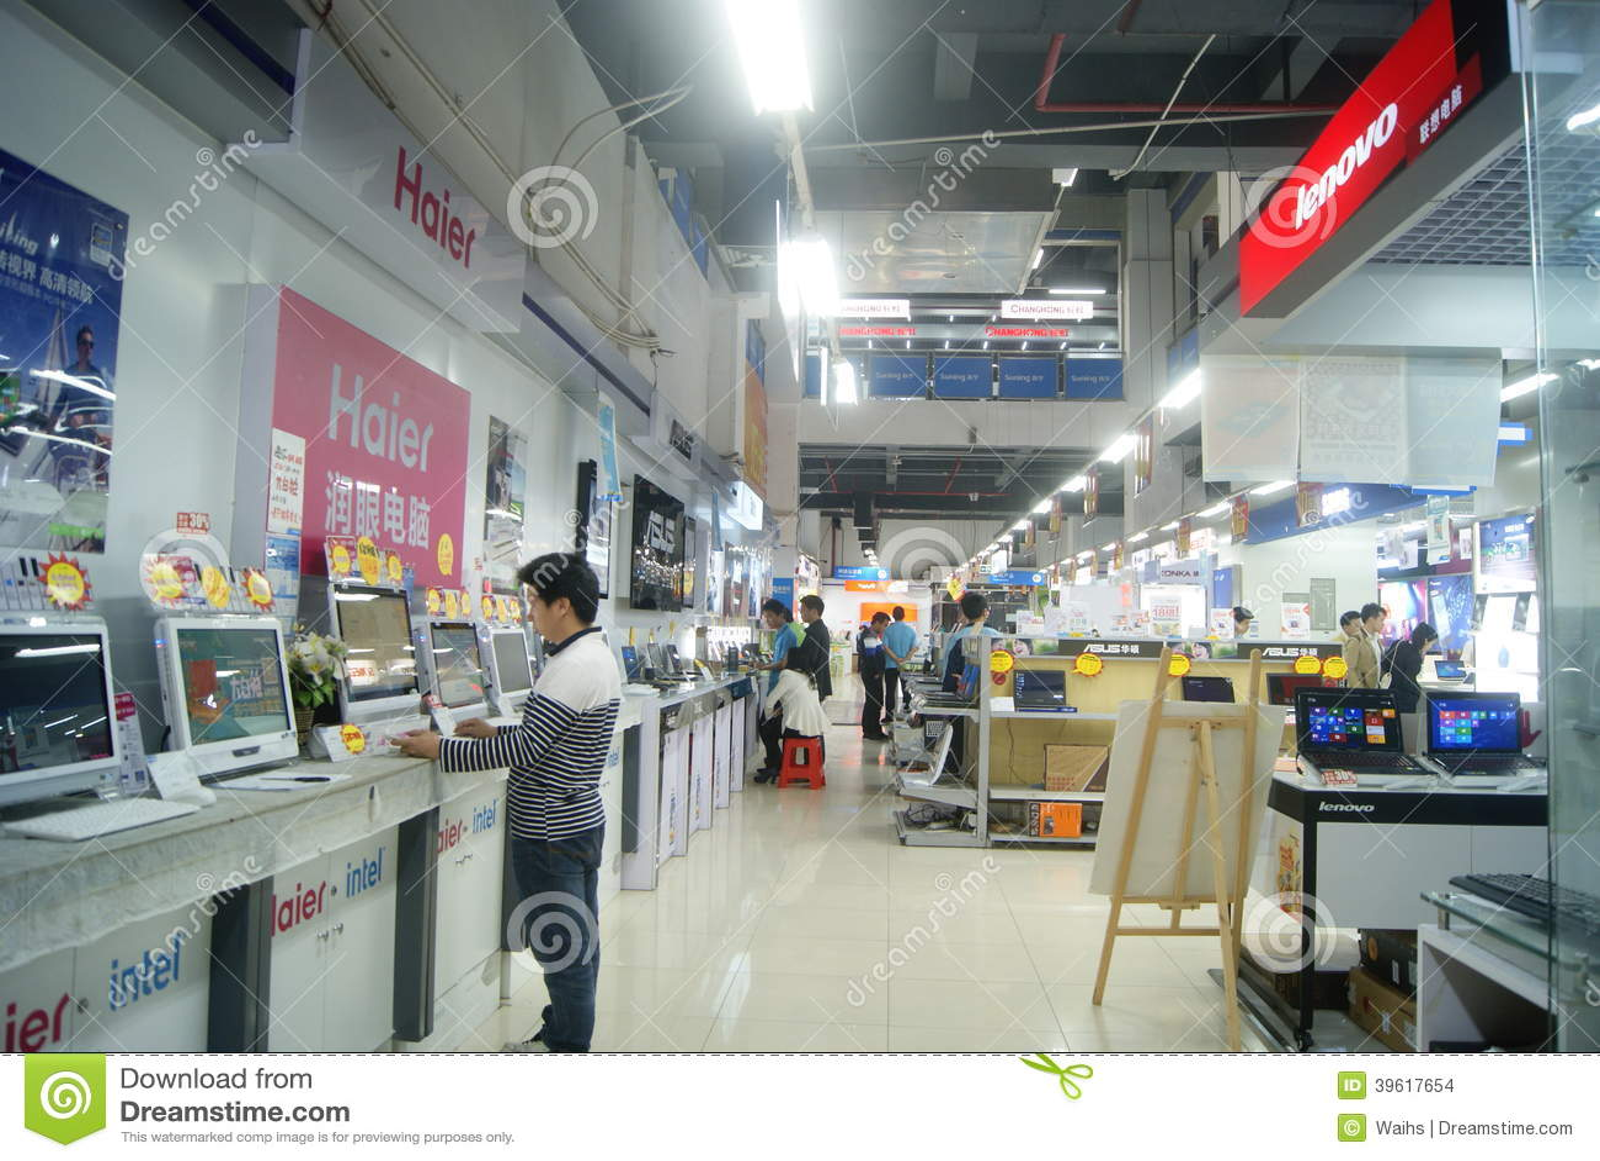 Shenzhen cina grandi magazzini di elettrodomestici di - Immagini di elettrodomestici ...